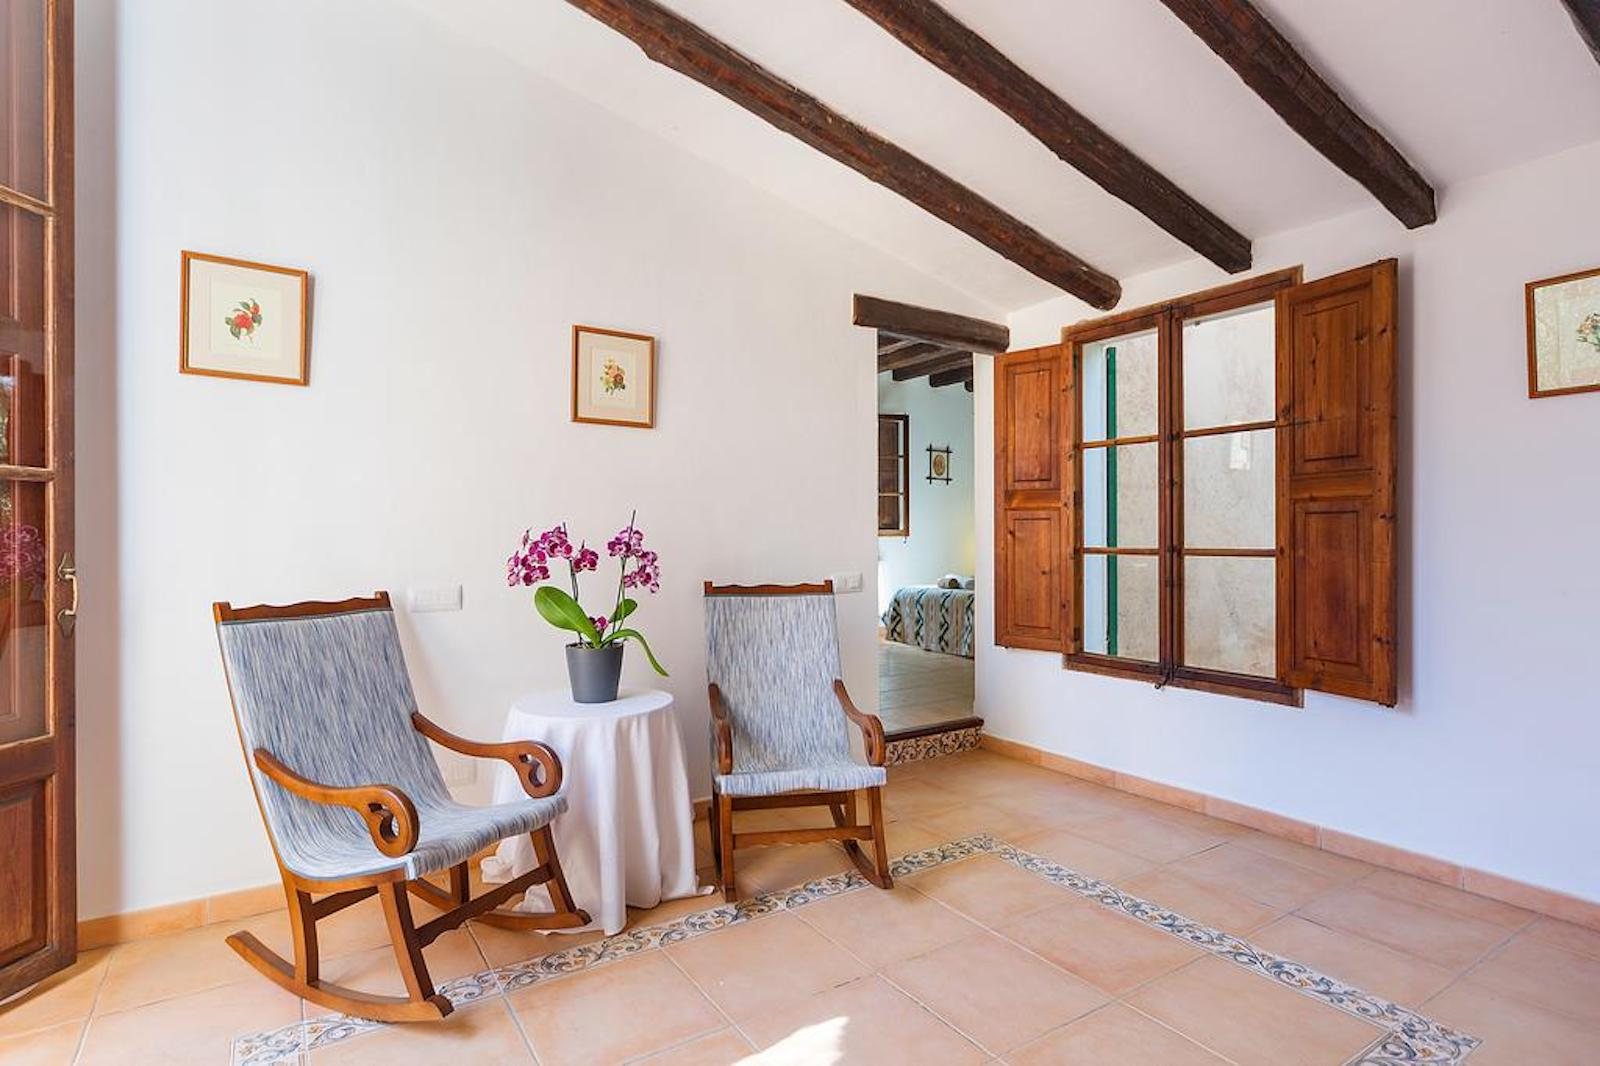 ISLA-Travel-Finca-Hotel-Mallorca-Suite WZ